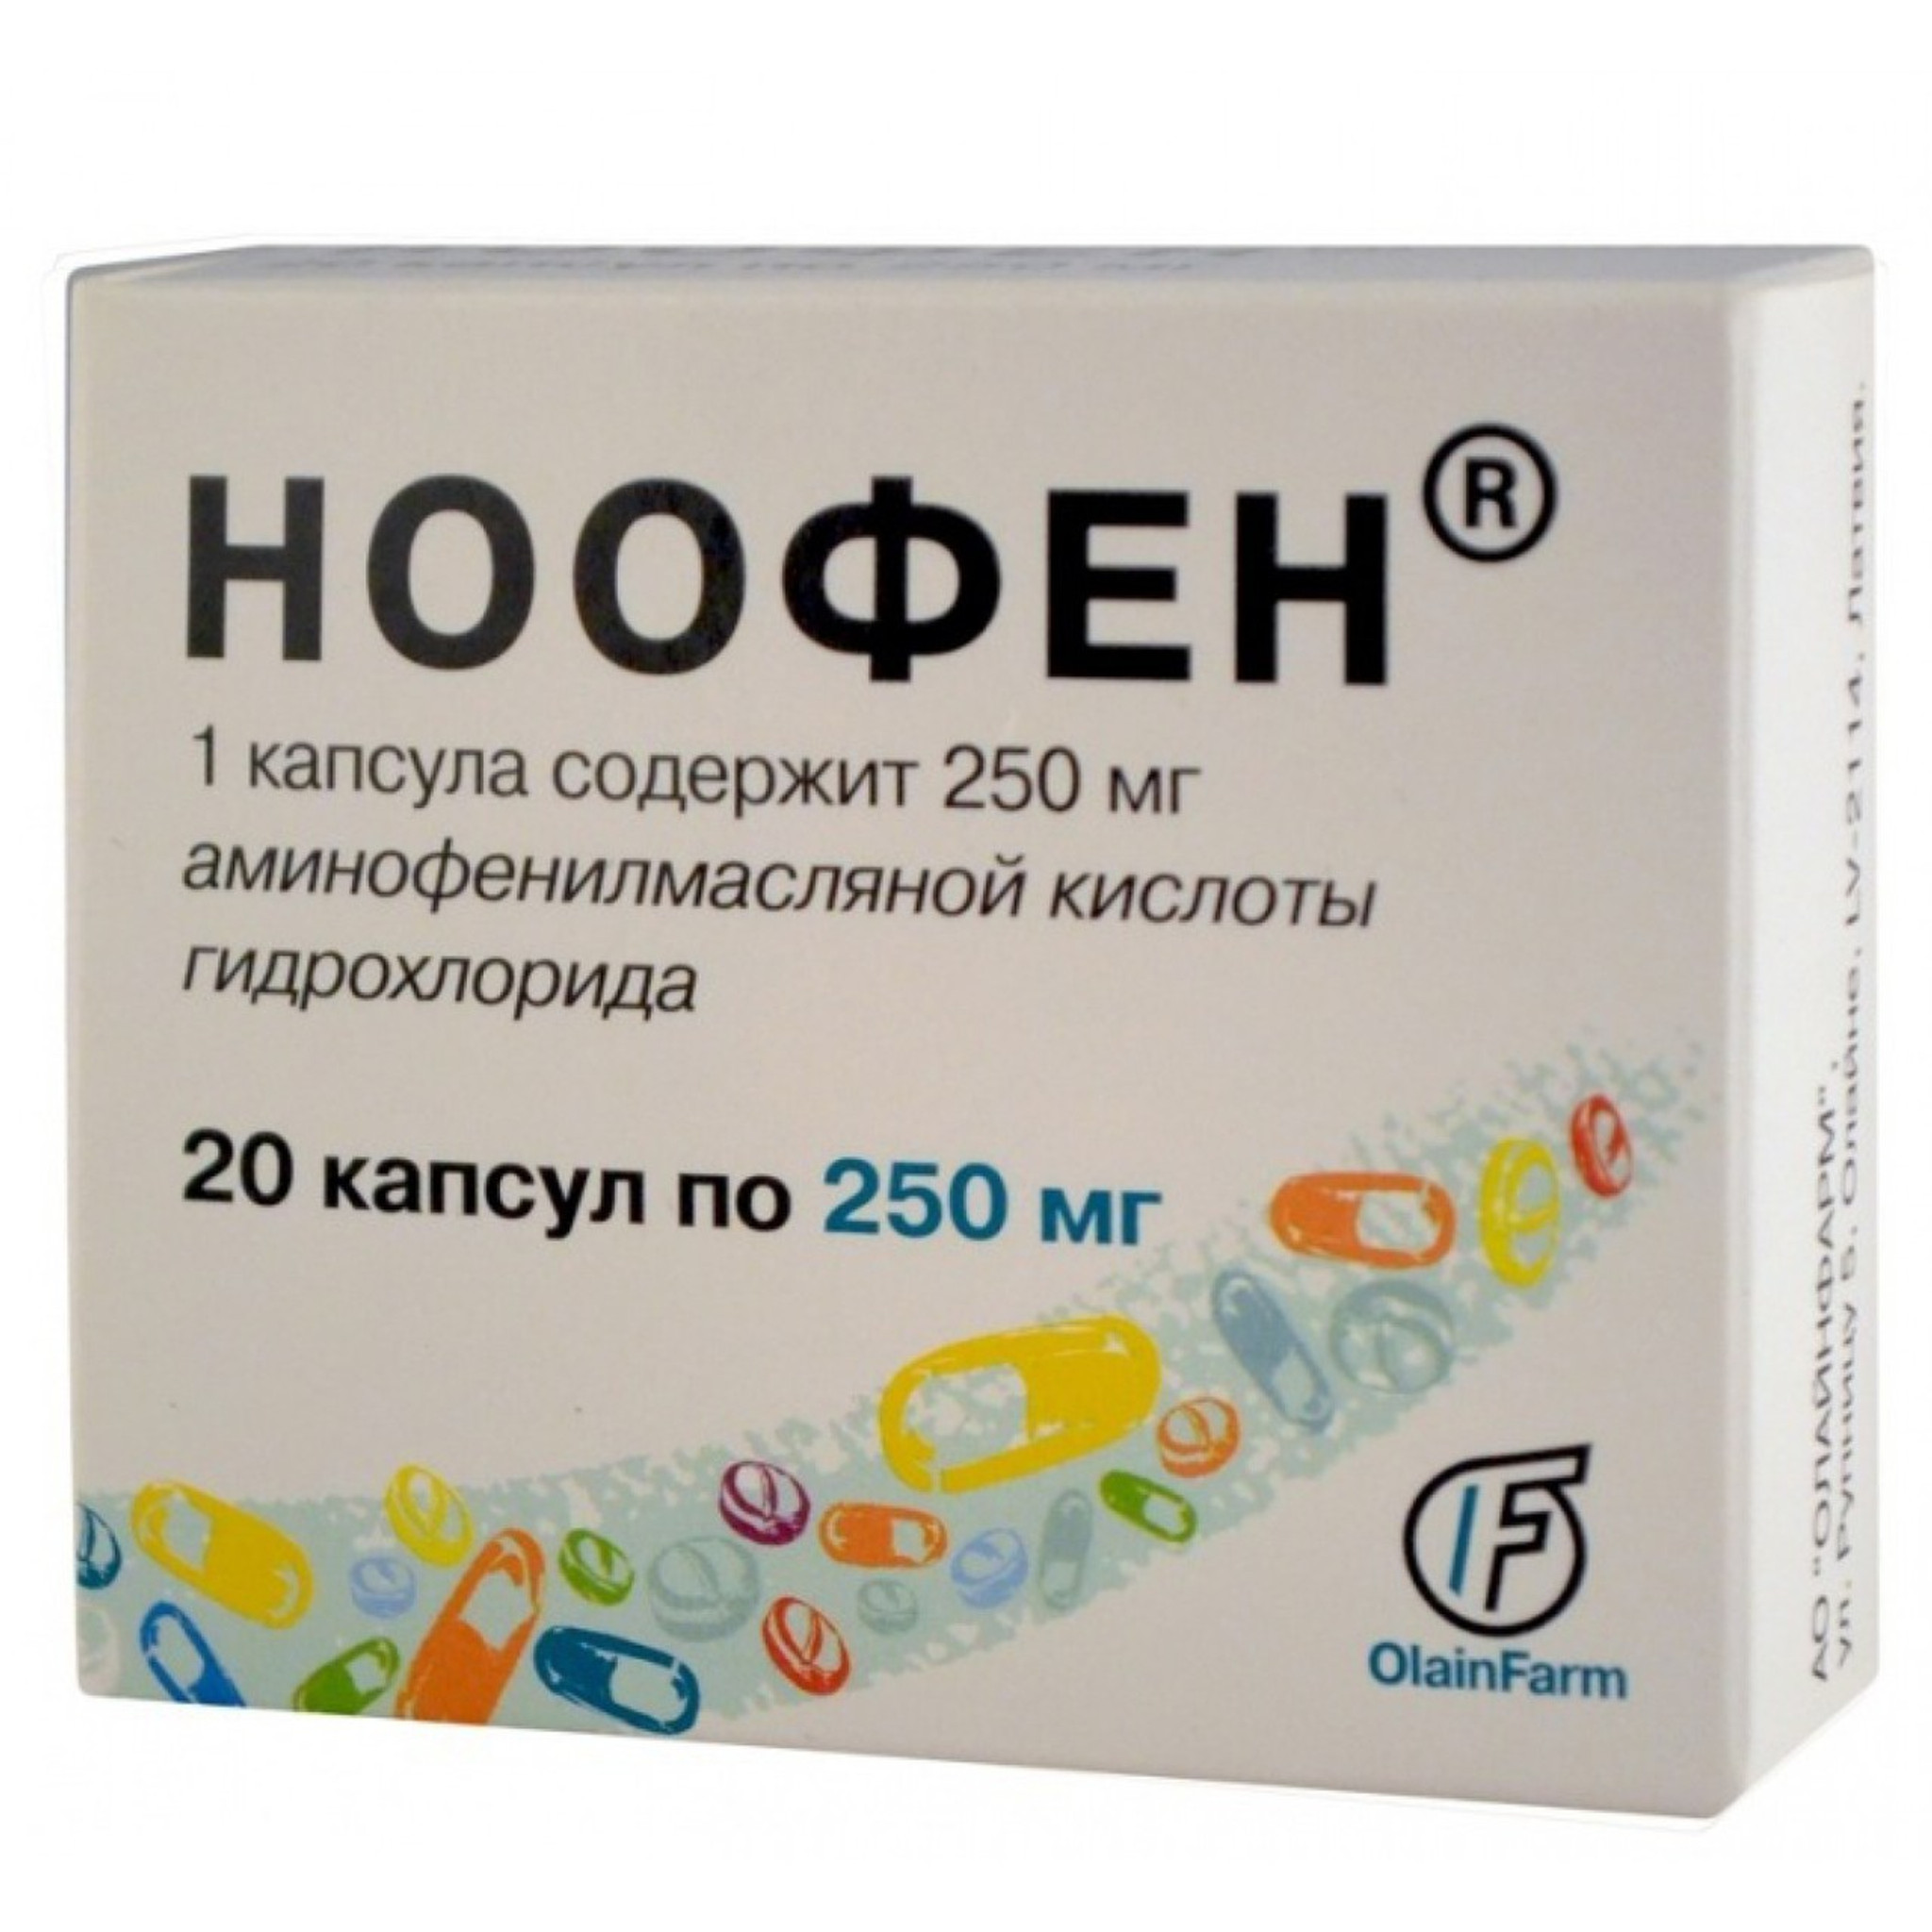 NOOFEN® (Phenibut-R, GABA) 250 mg/tab, 20 tabs